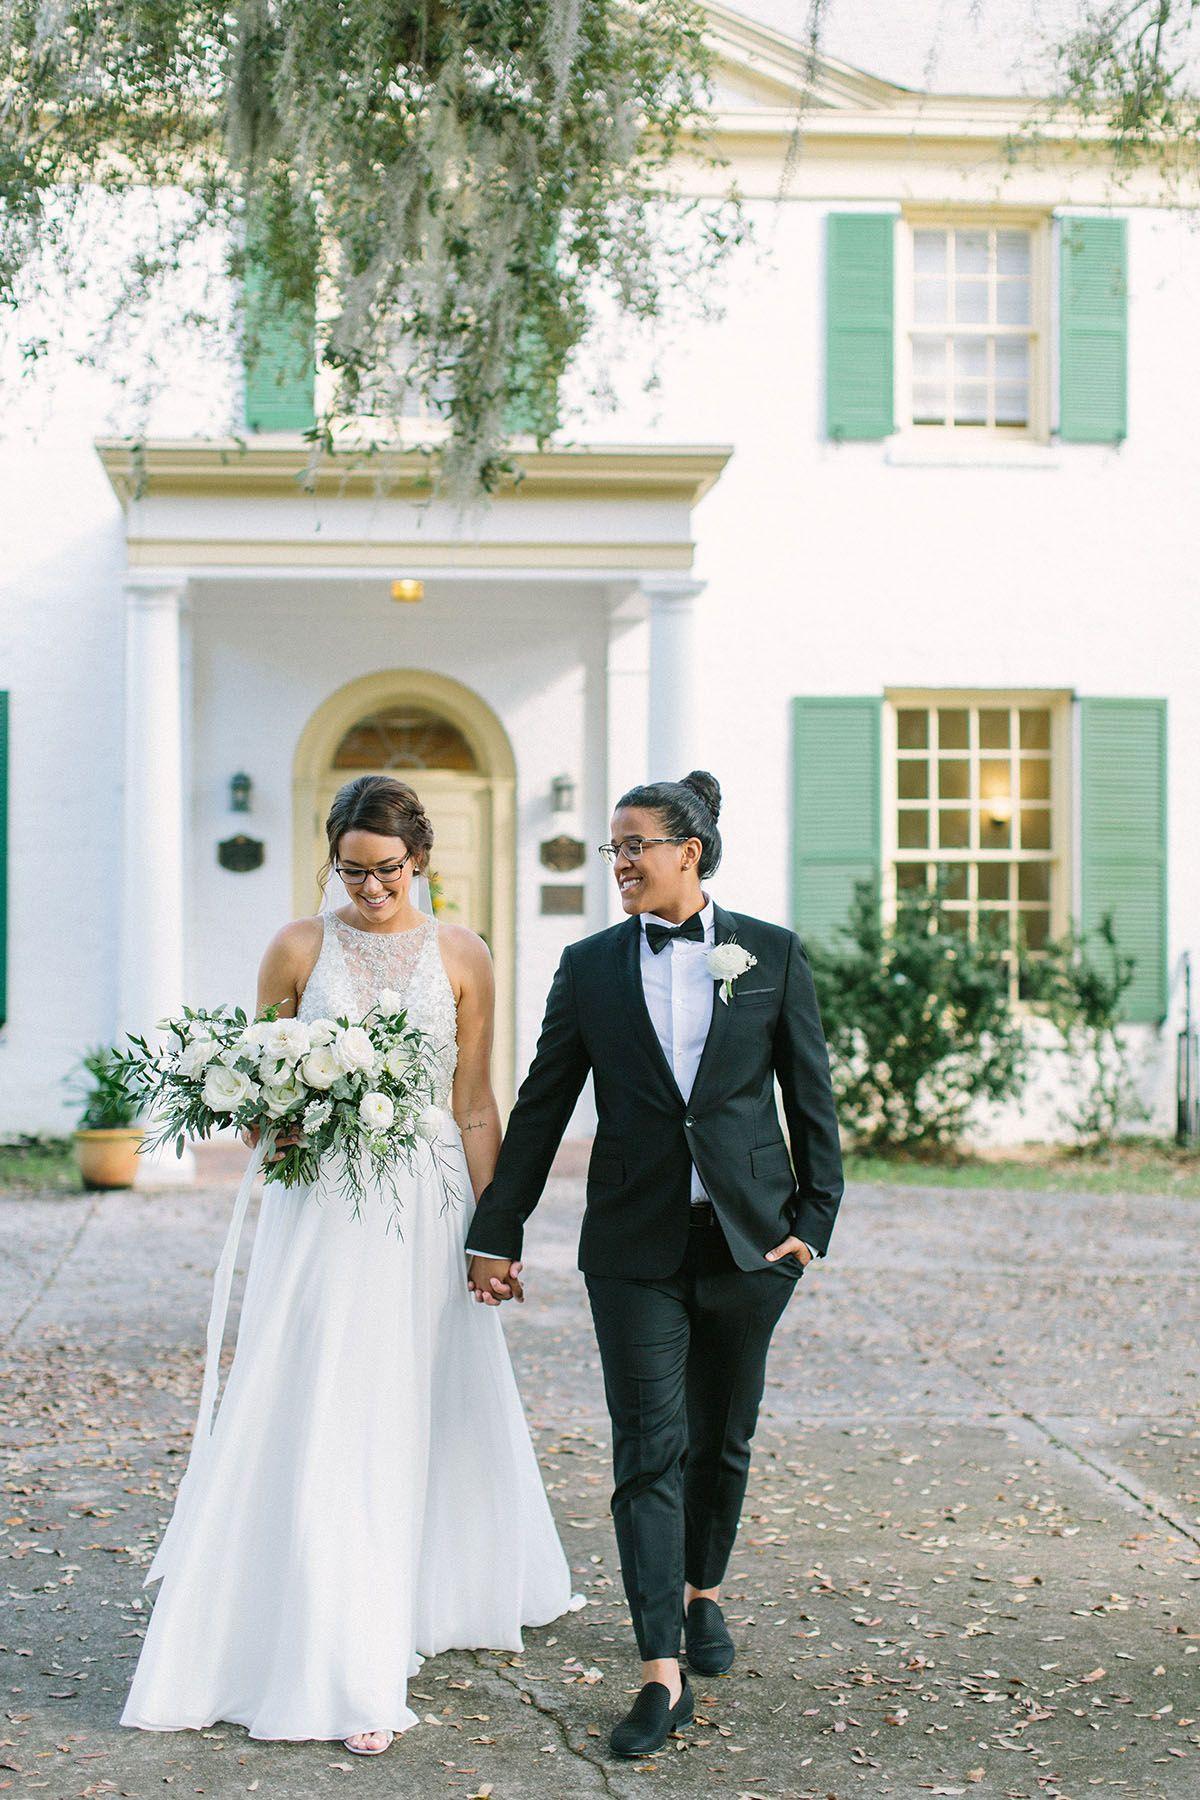 Modern Lush Greenery Wedding In Jacksonville Florida Wedding Wedding Styles Two Brides